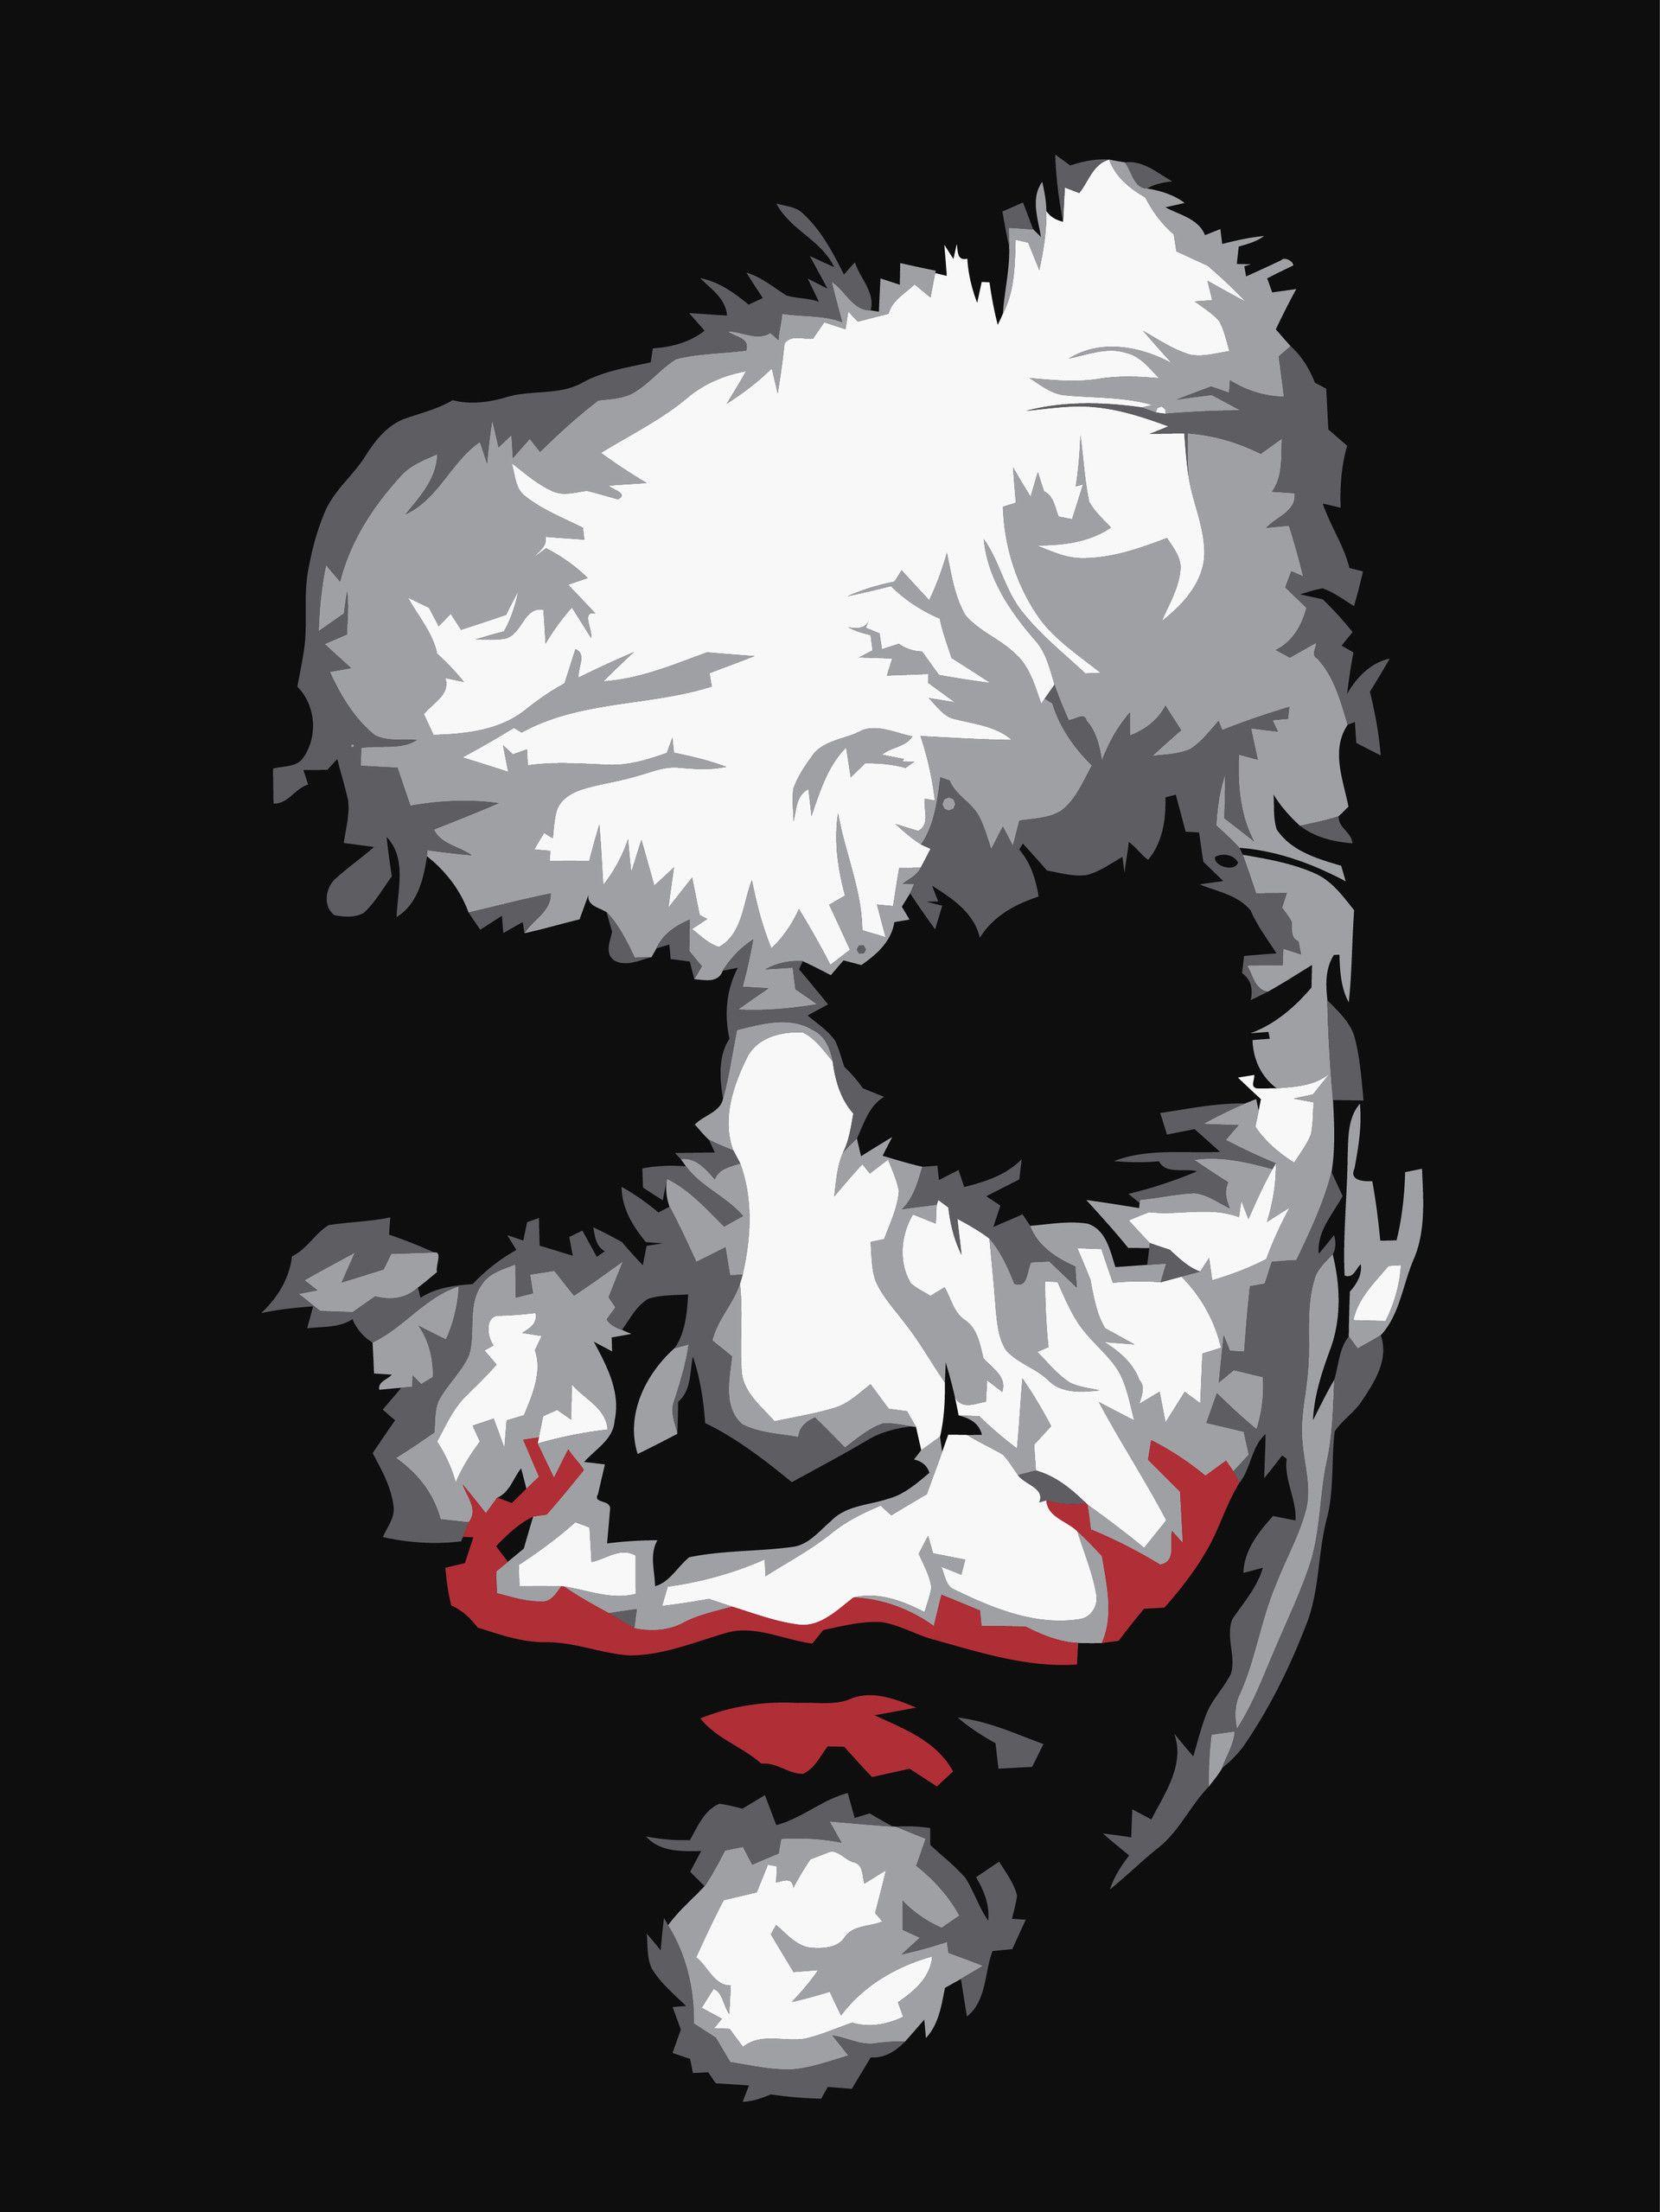 Heath Ledger Tribute, Mohammad Nidal Khan